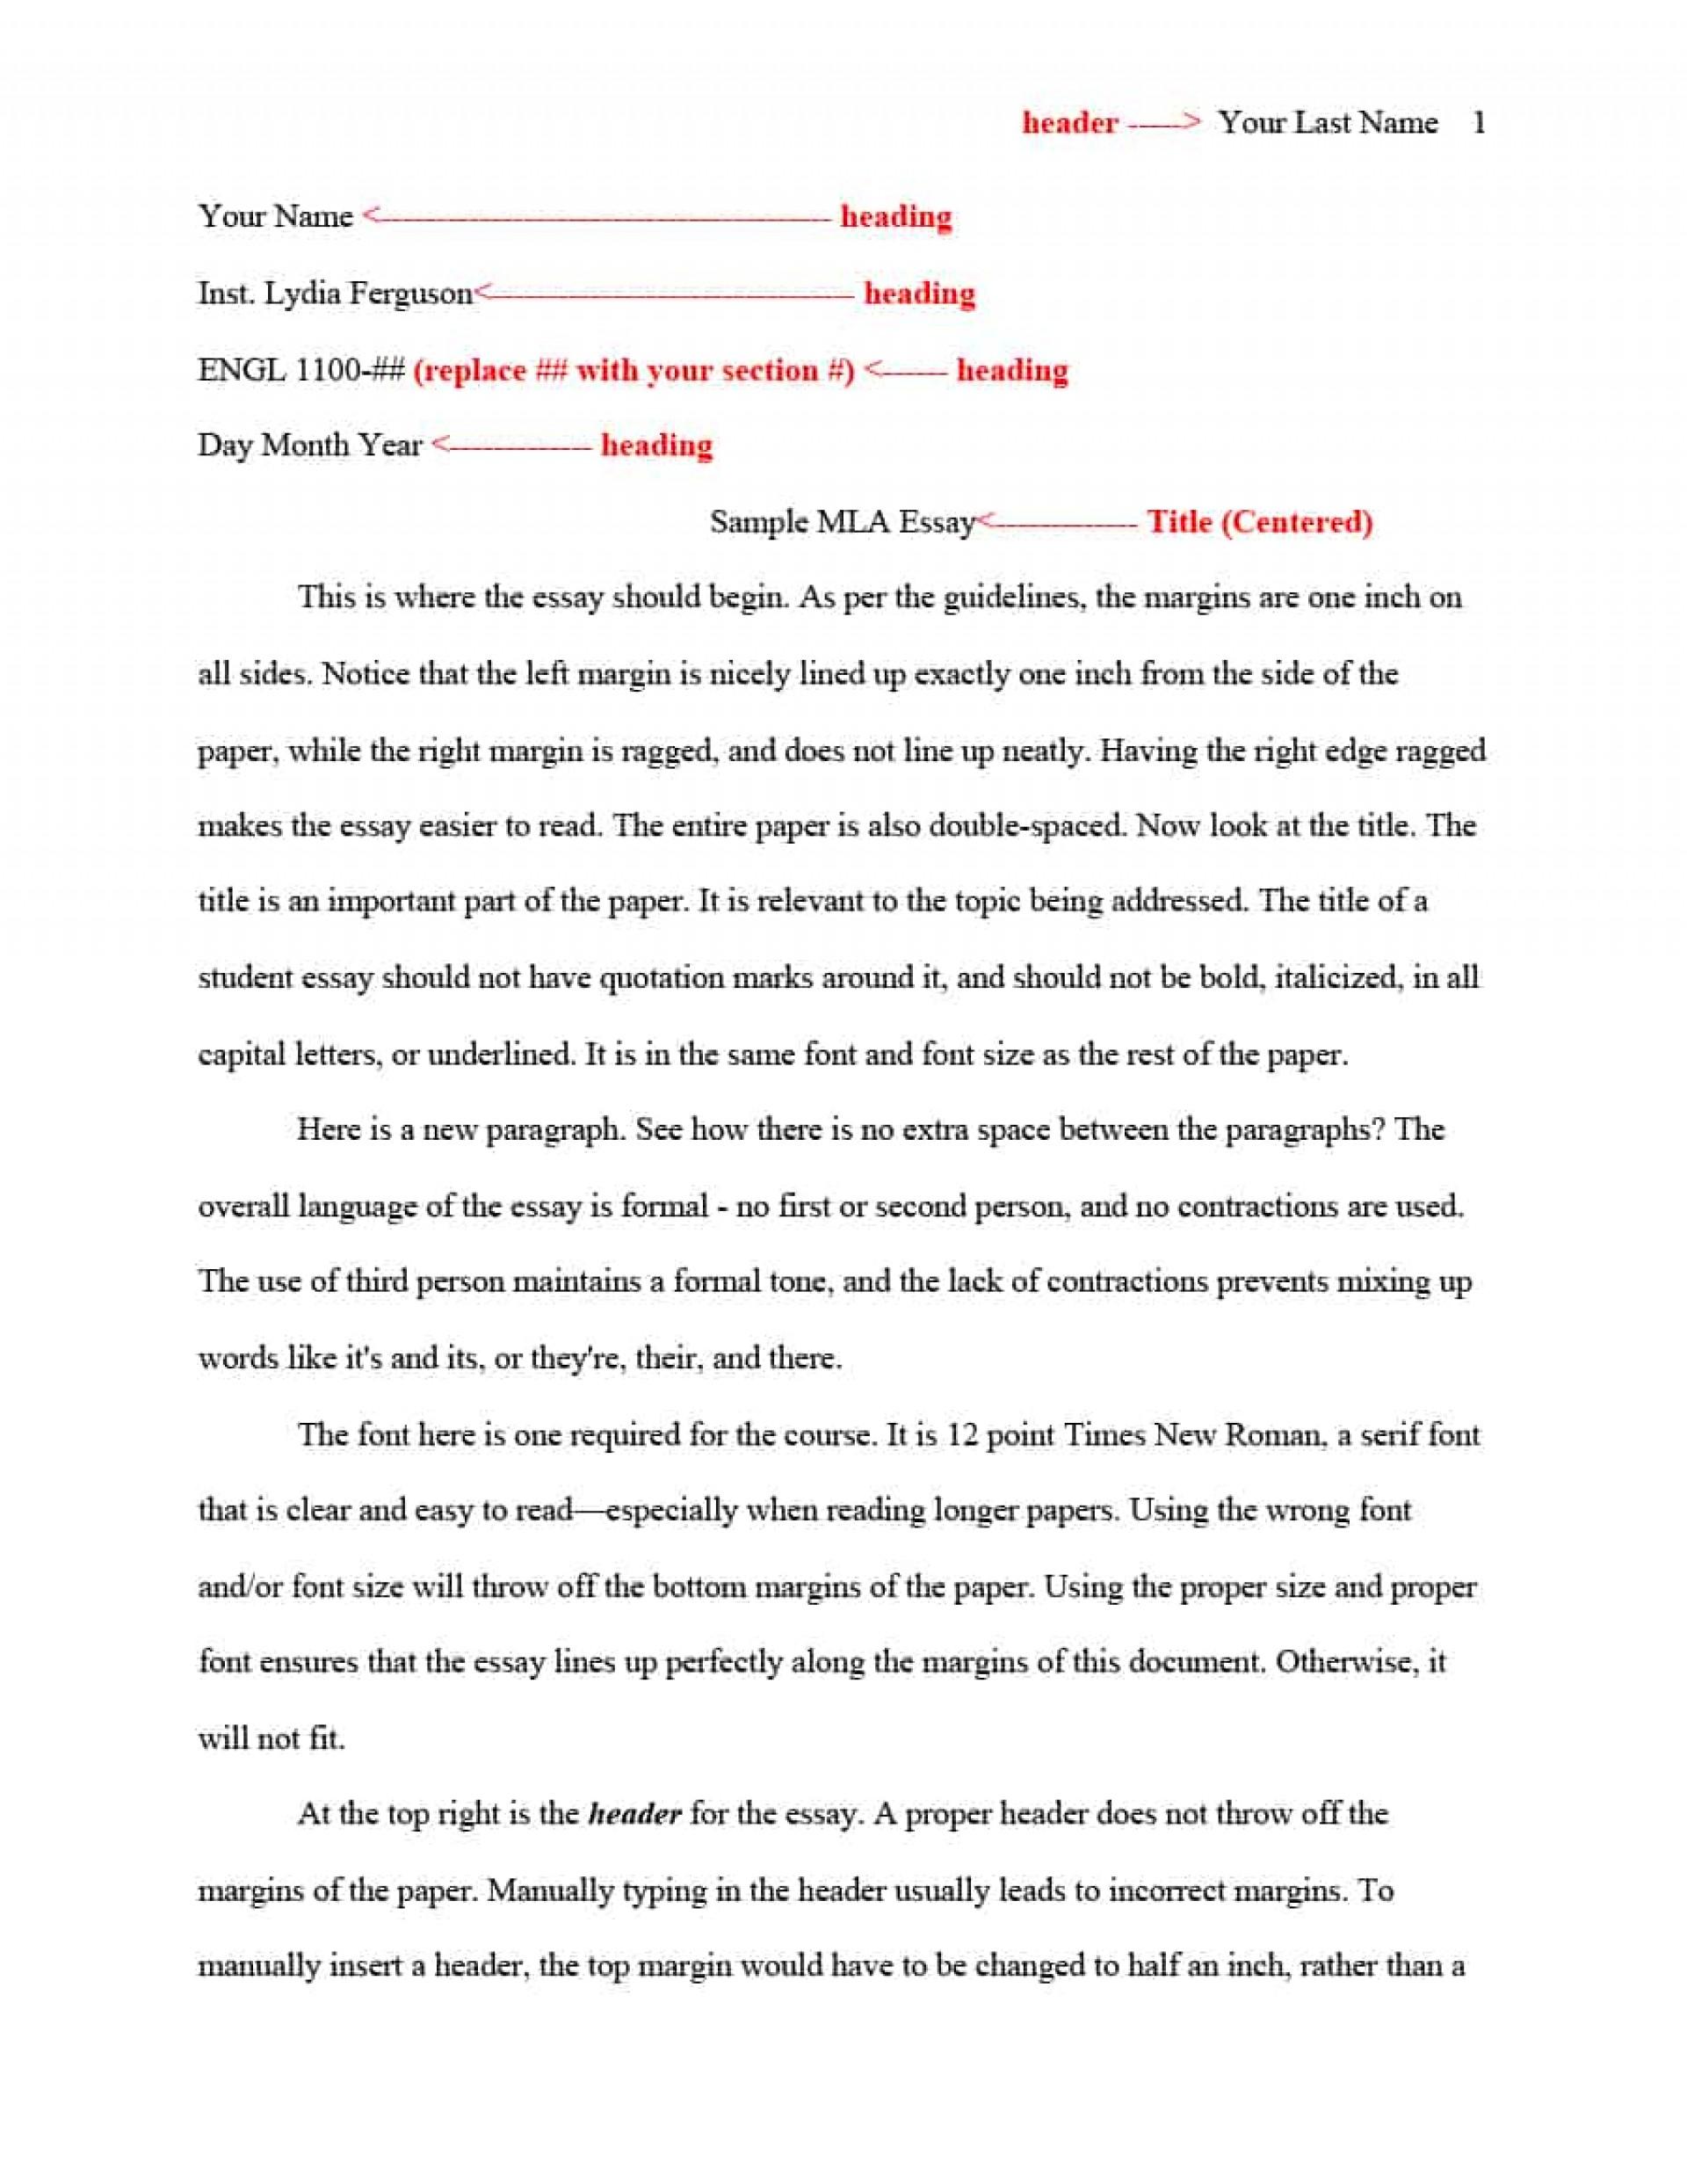 011 Mla Format Template Essay Example Magnificent Essays Persuasive Outline 2017 1920